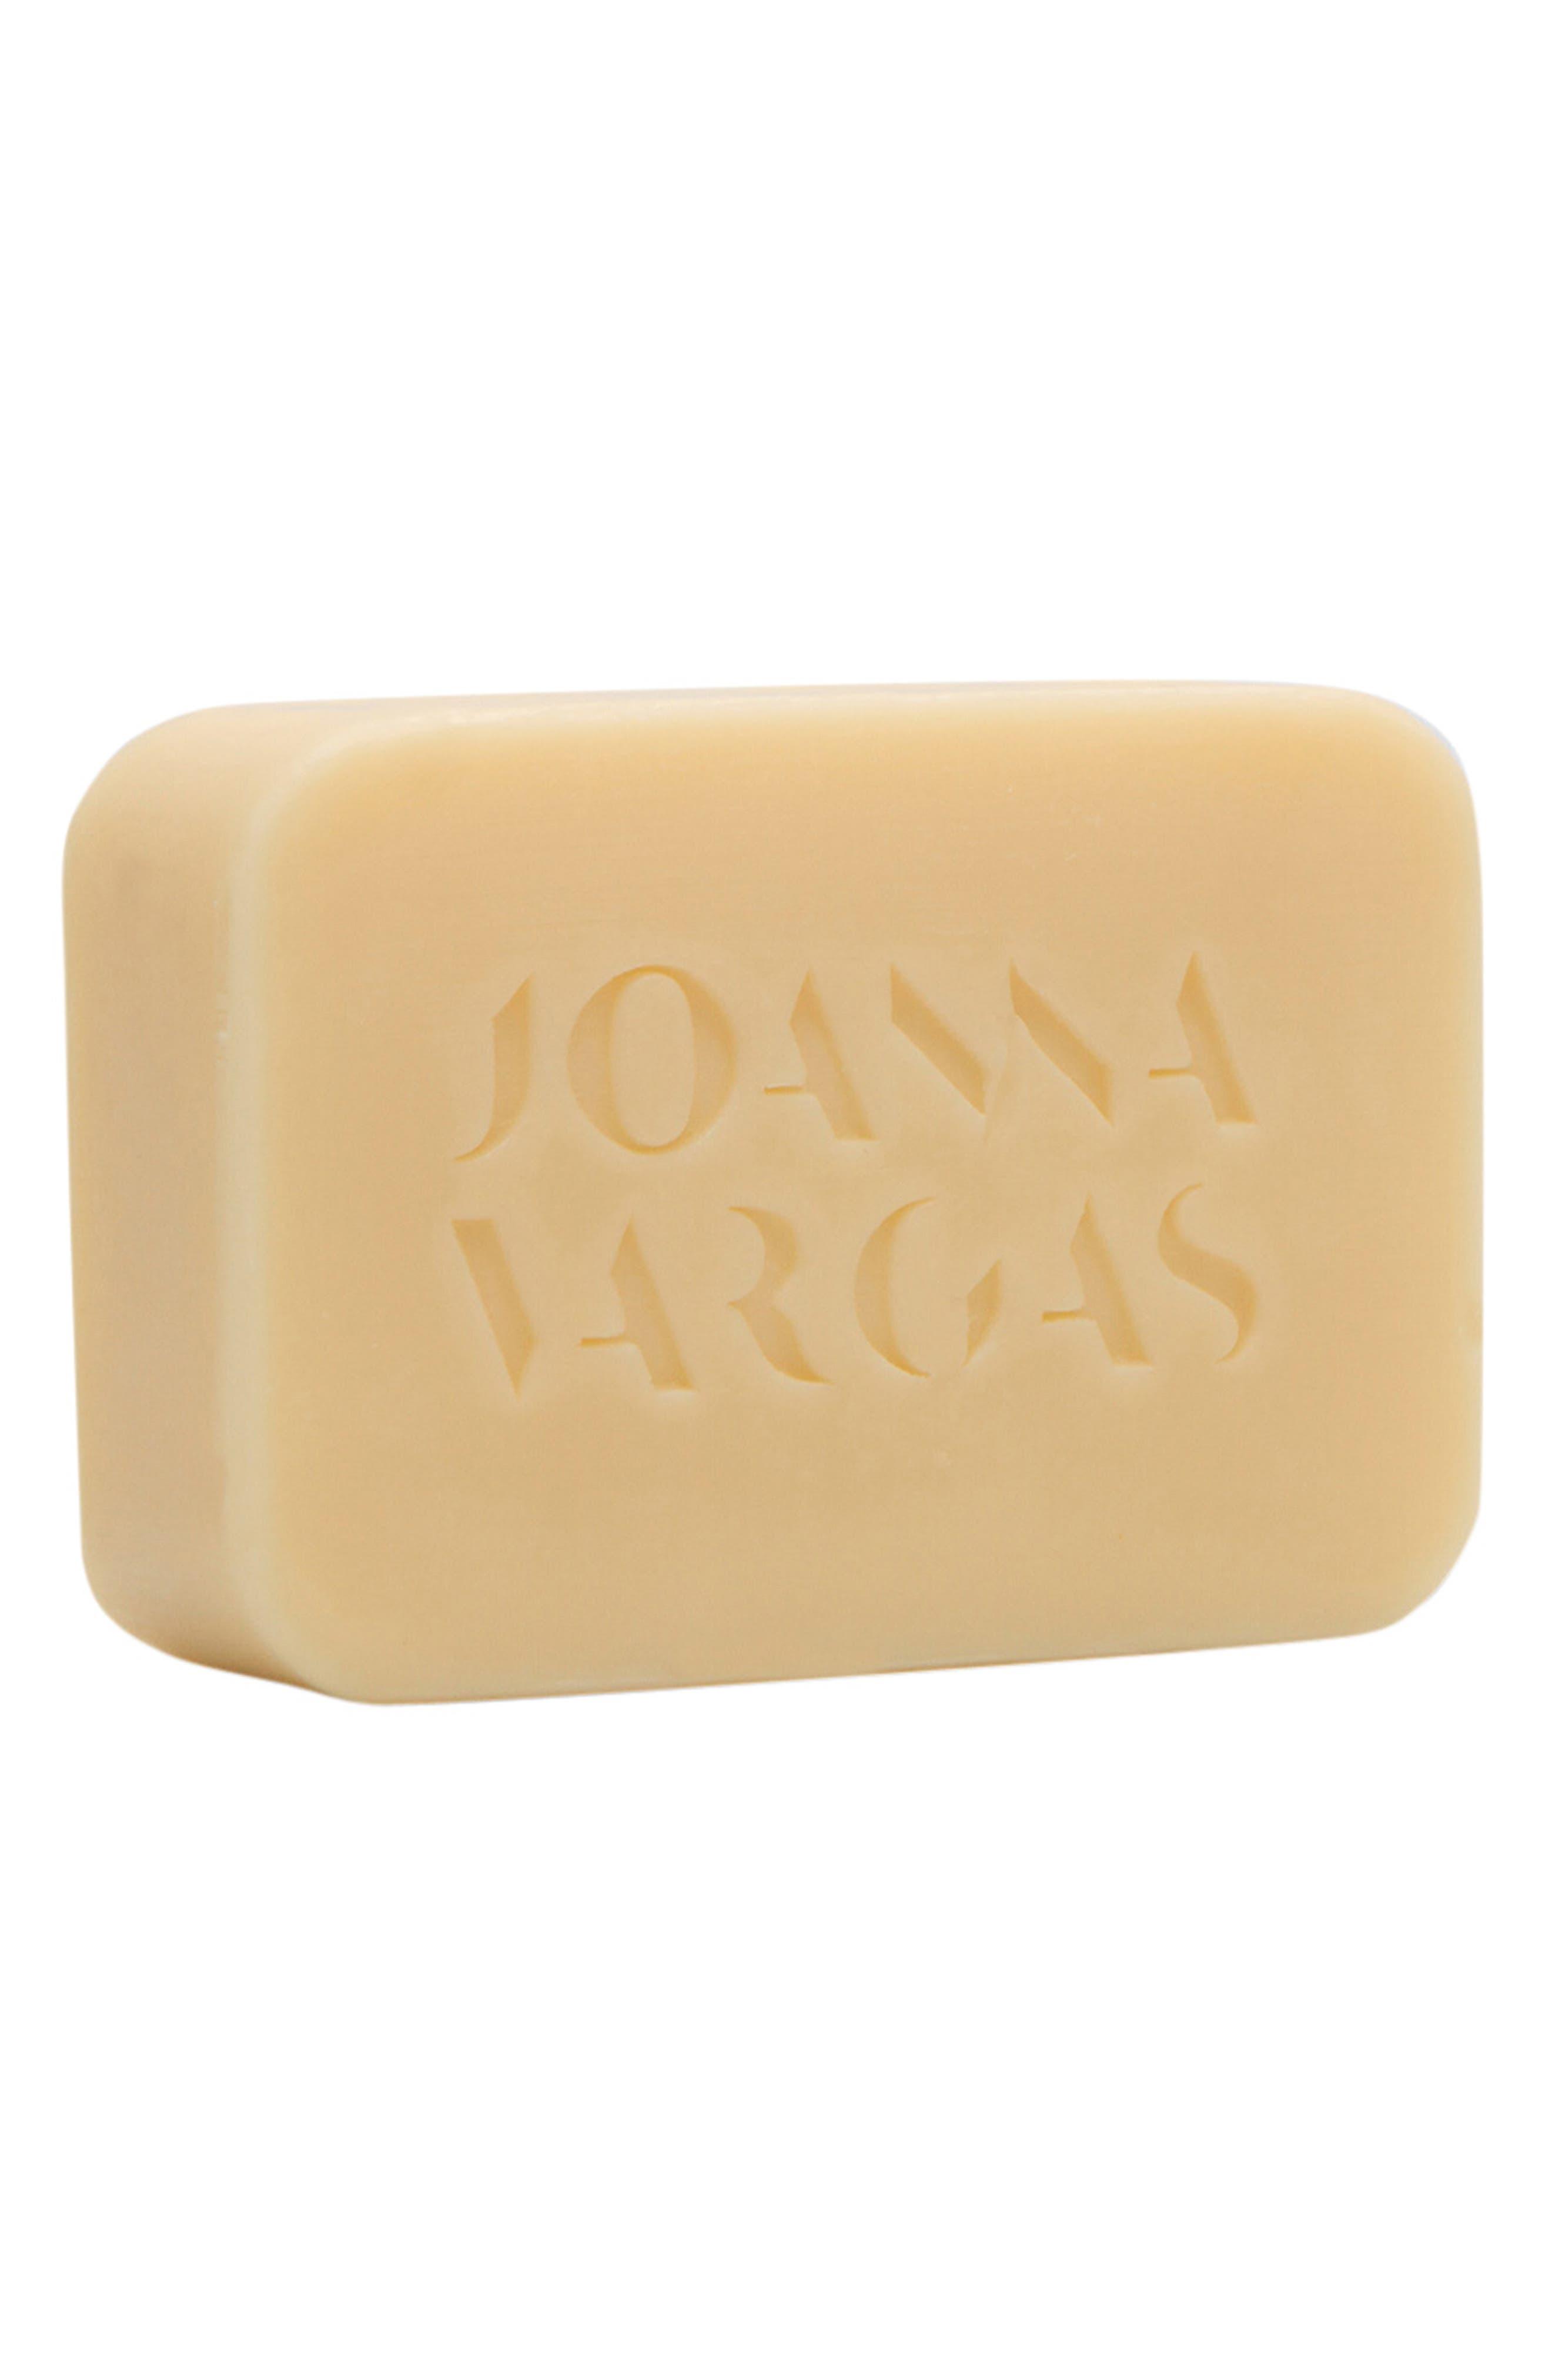 JOANNA VARGAS Cloud Bar